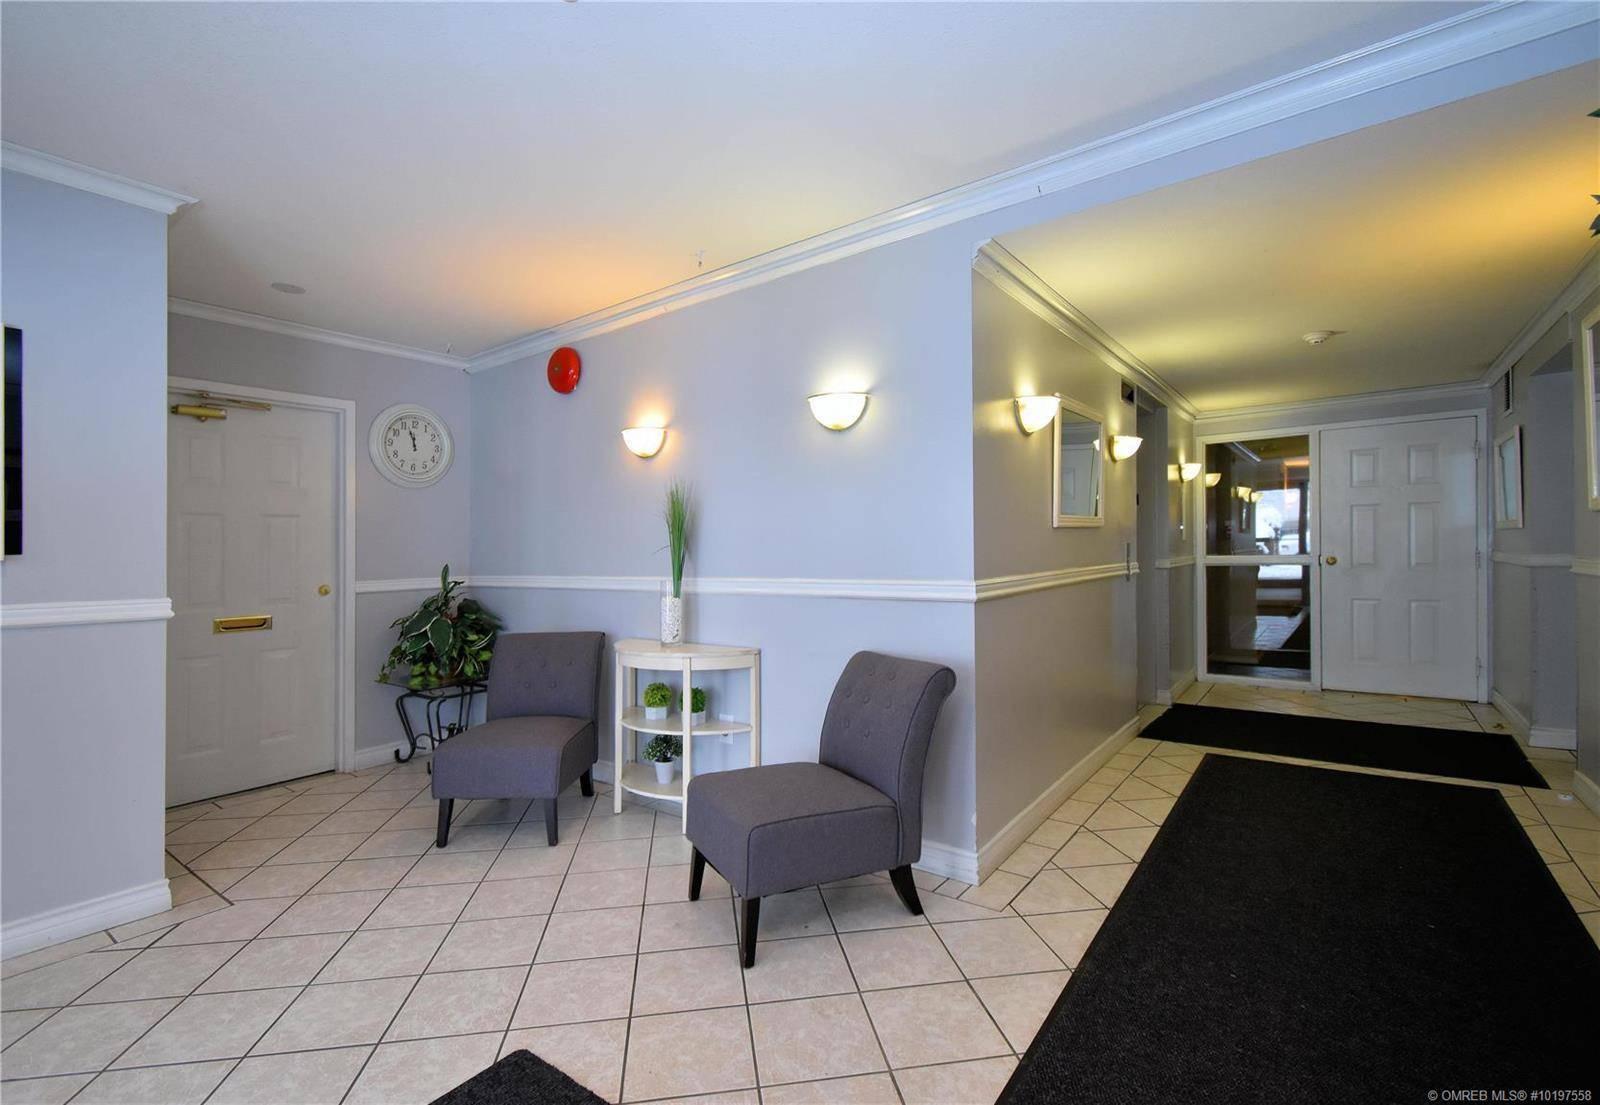 Condo for sale at 3115 Demontreuil Ct Unit 308 Kelowna British Columbia - MLS: 10197558